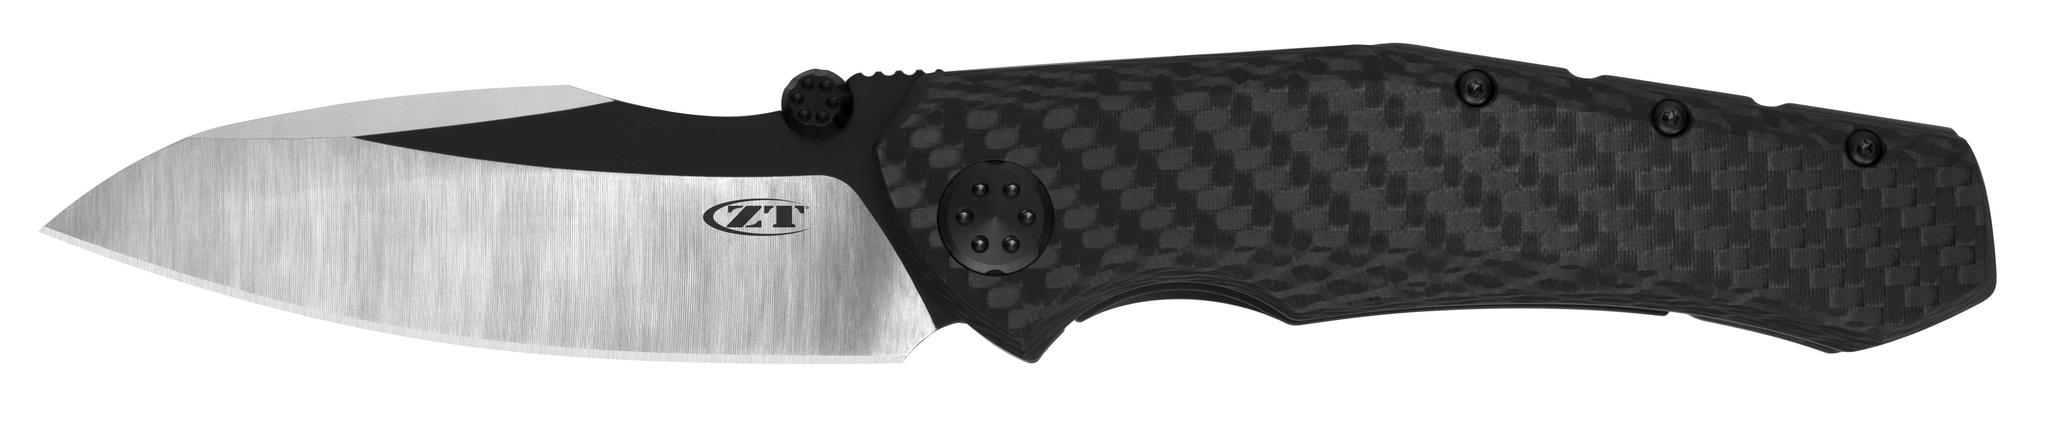 Фото - Складной нож Zero Tolerance K0850CF Rexford, сталь CPM 20CV, сатин/DLC